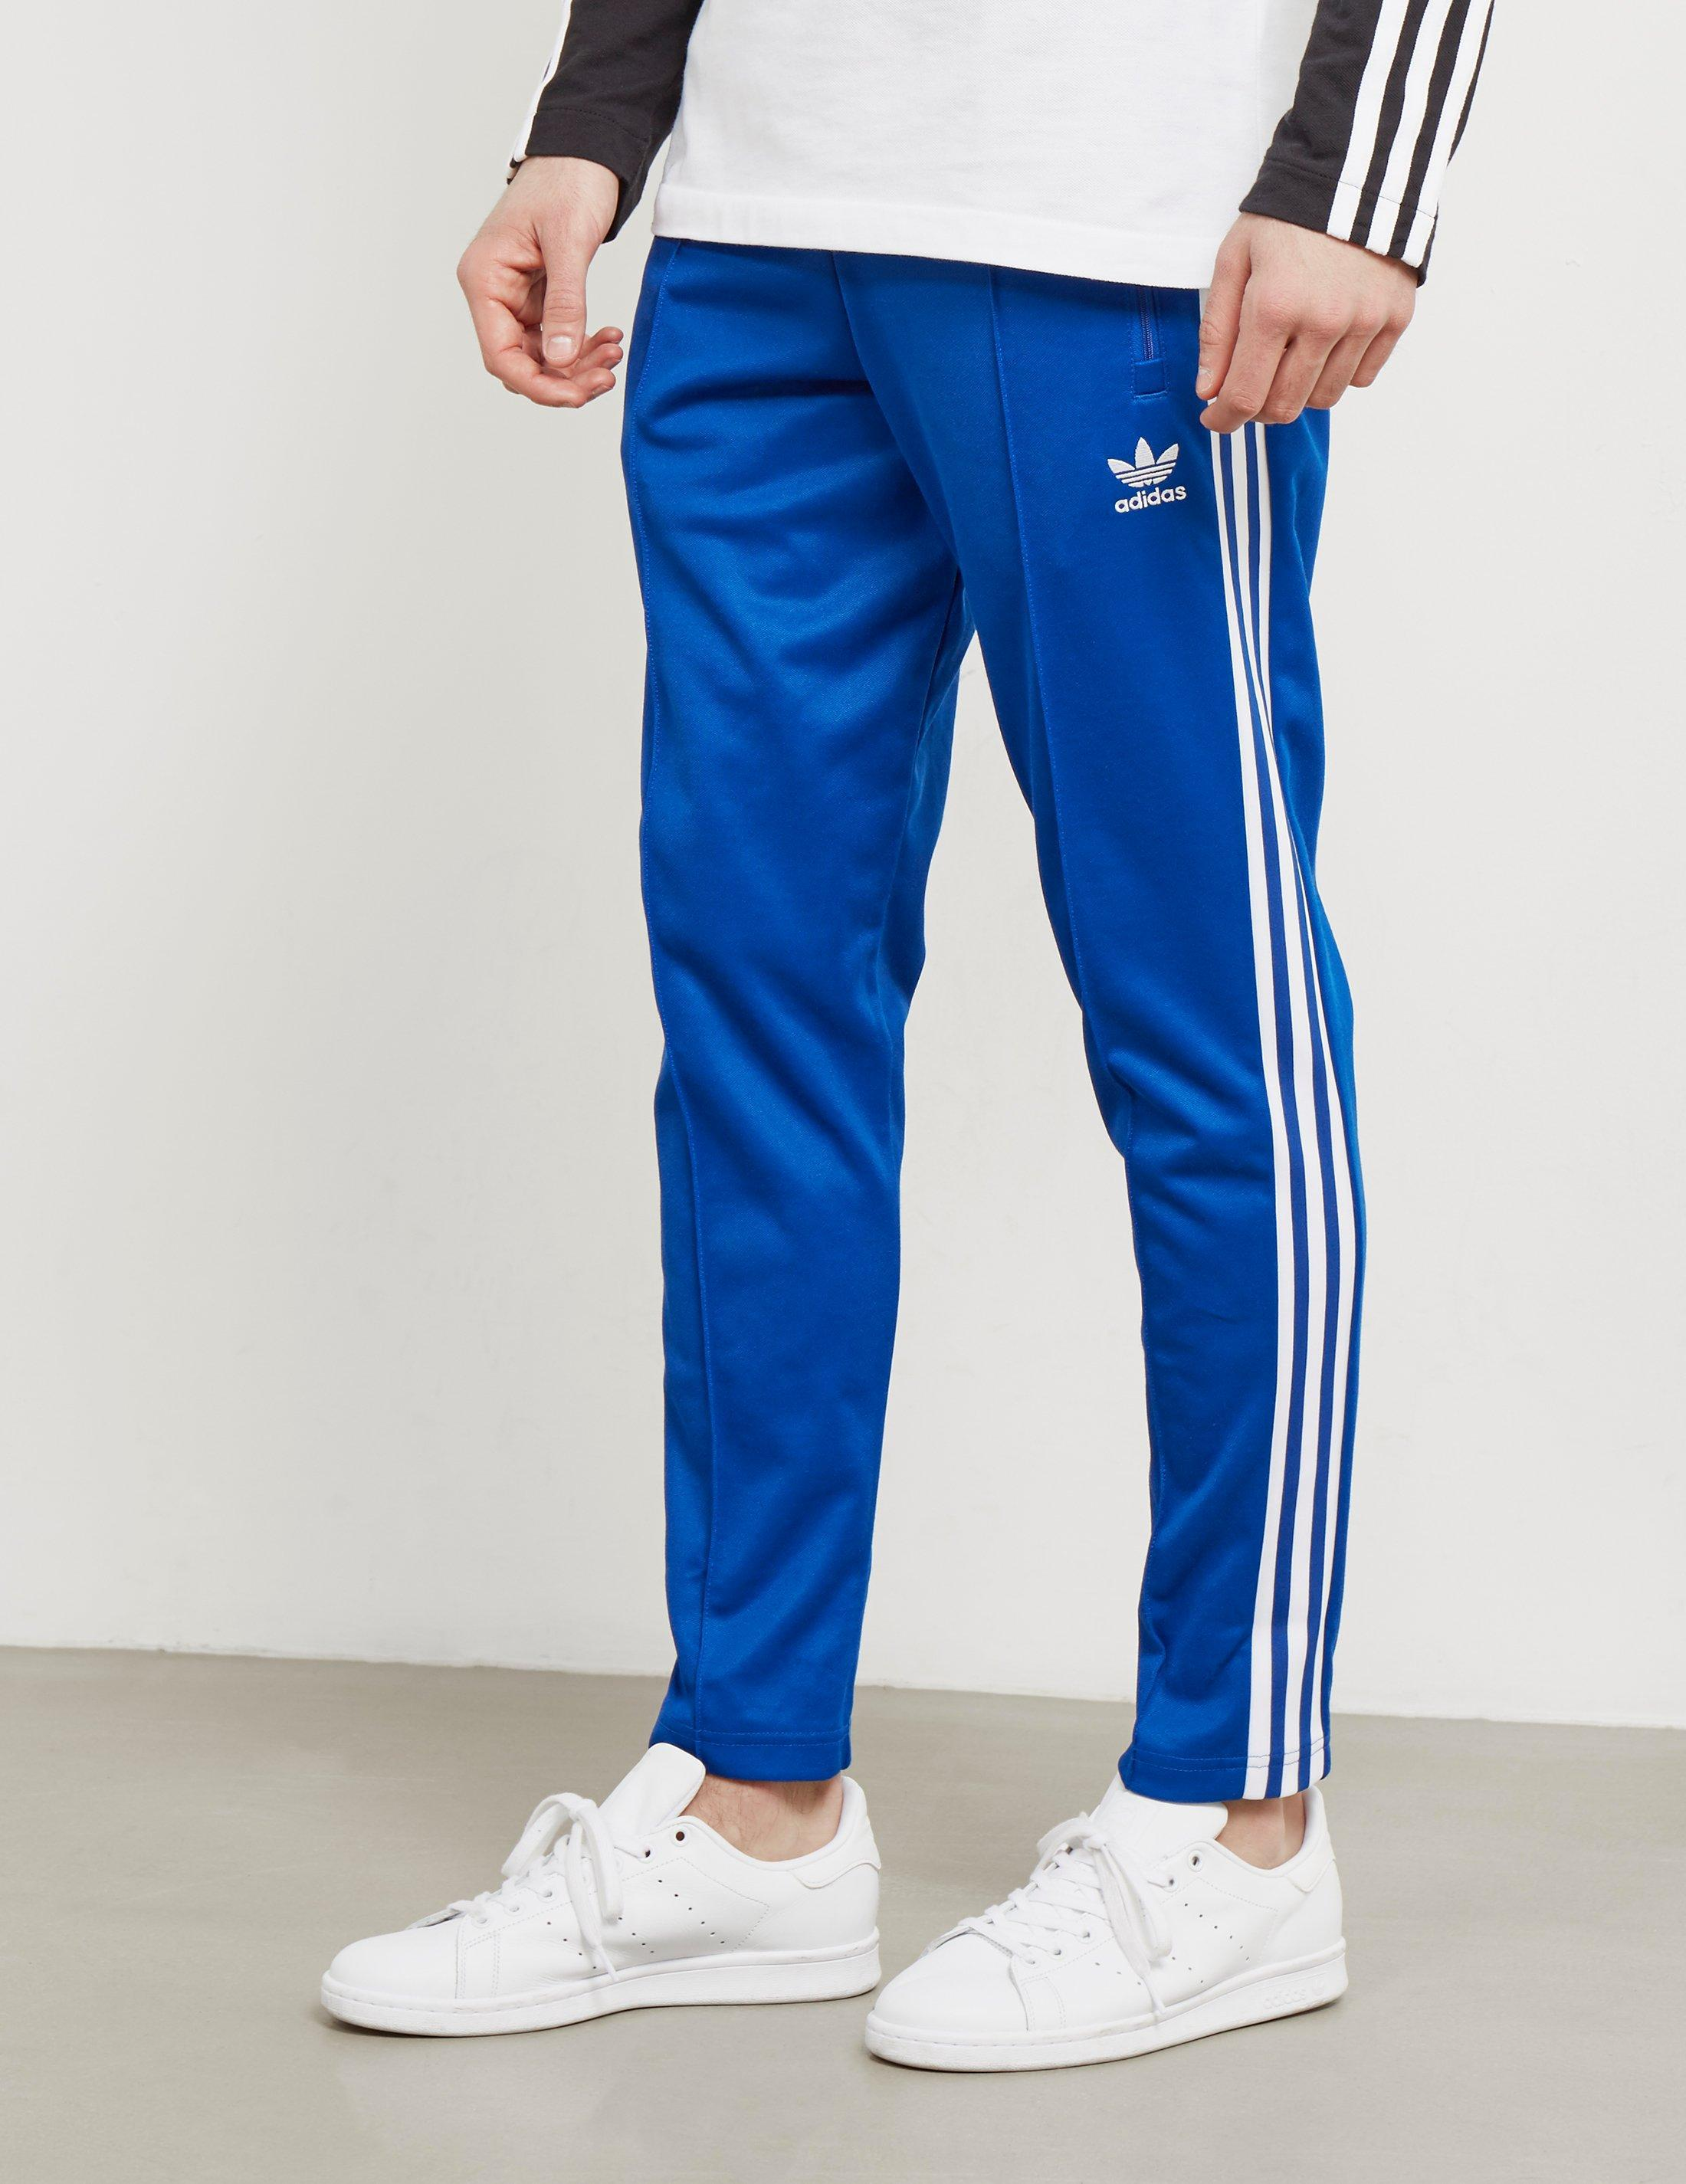 adidas Originals Cotton Mens Beckenbauer Cuffed Track Pants